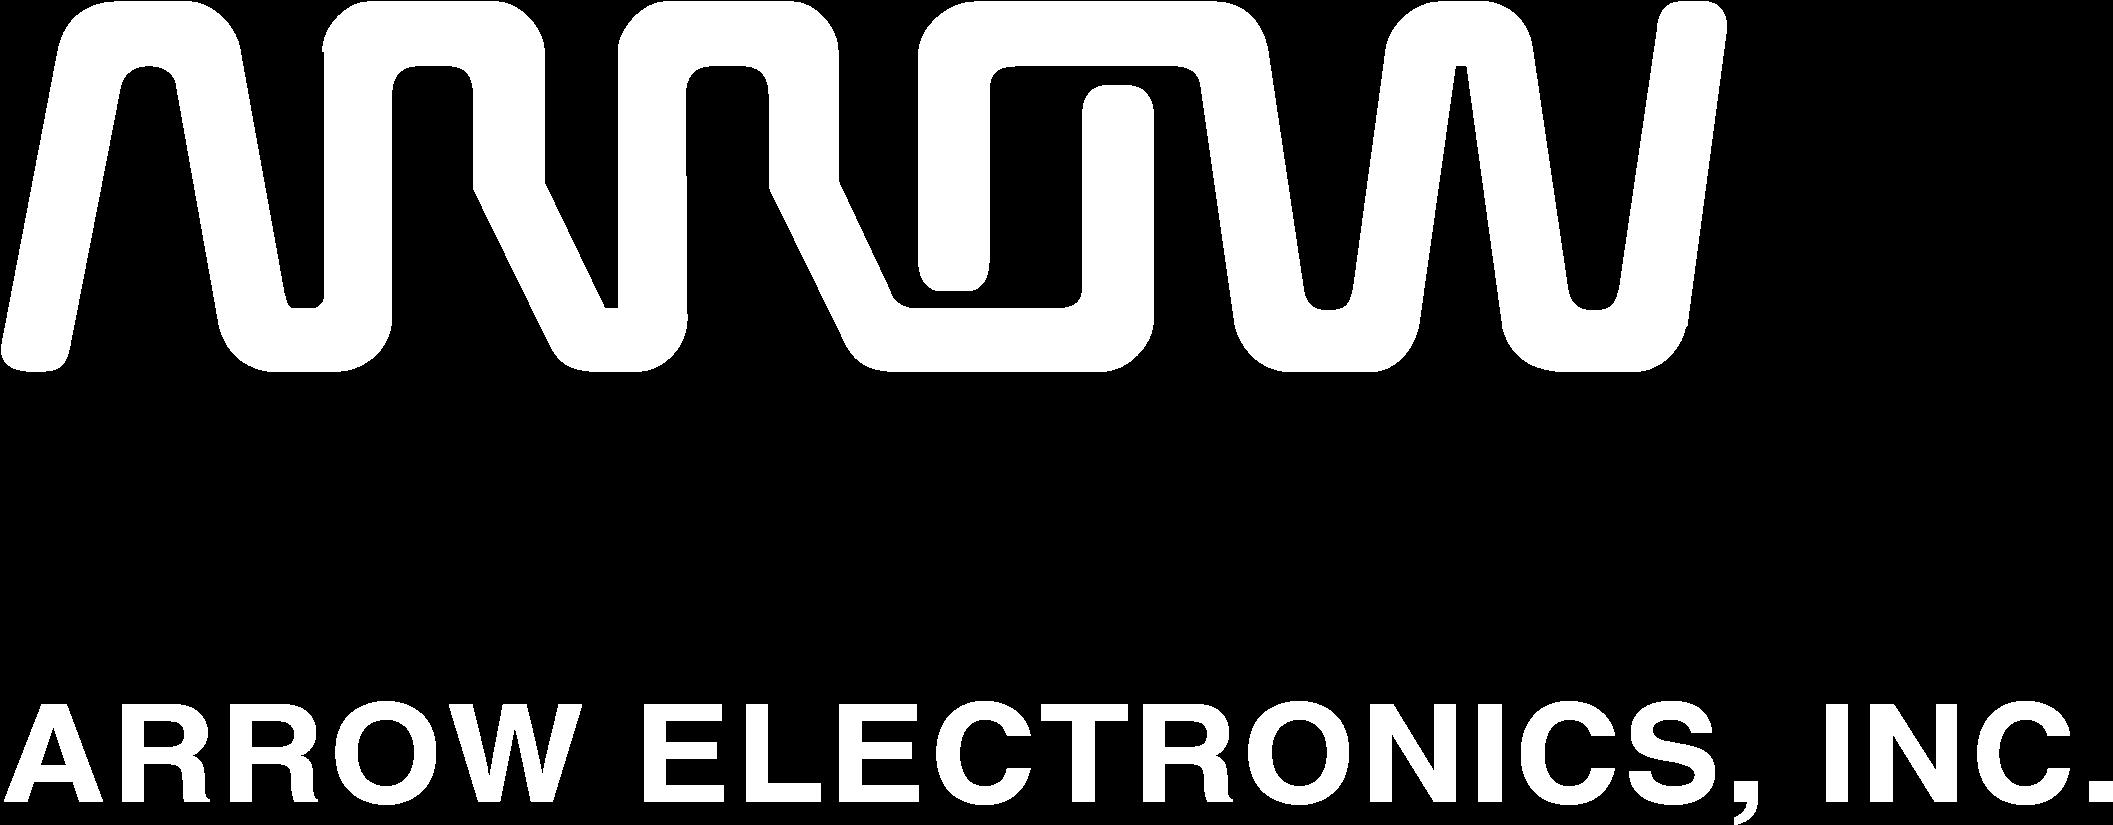 Arrow Electronics 01 Logo Black And White Focus.